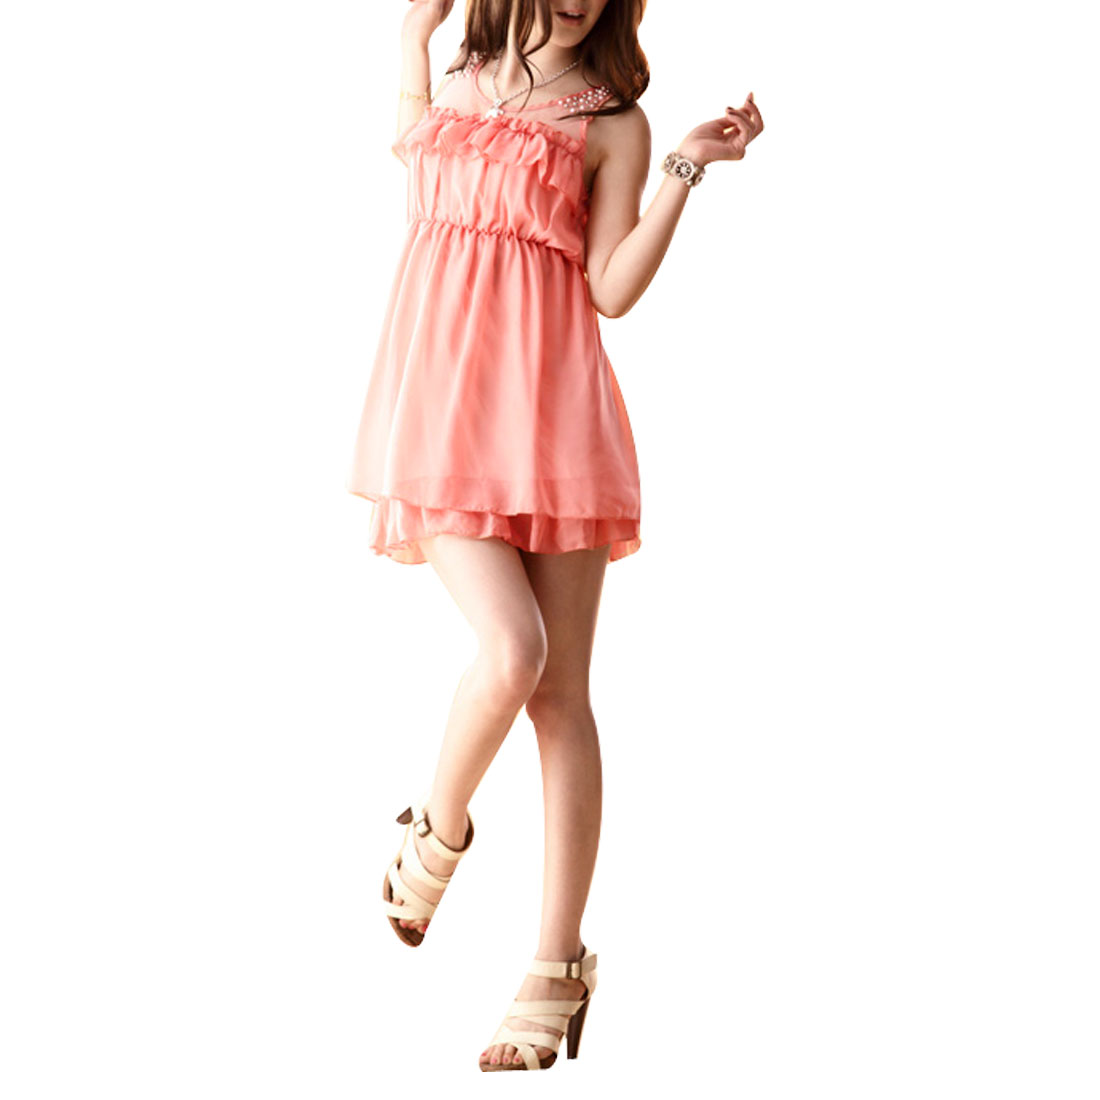 XS Plastic Beaded Detail Ruffled Hem Mini Dress Peach Pink for Woman